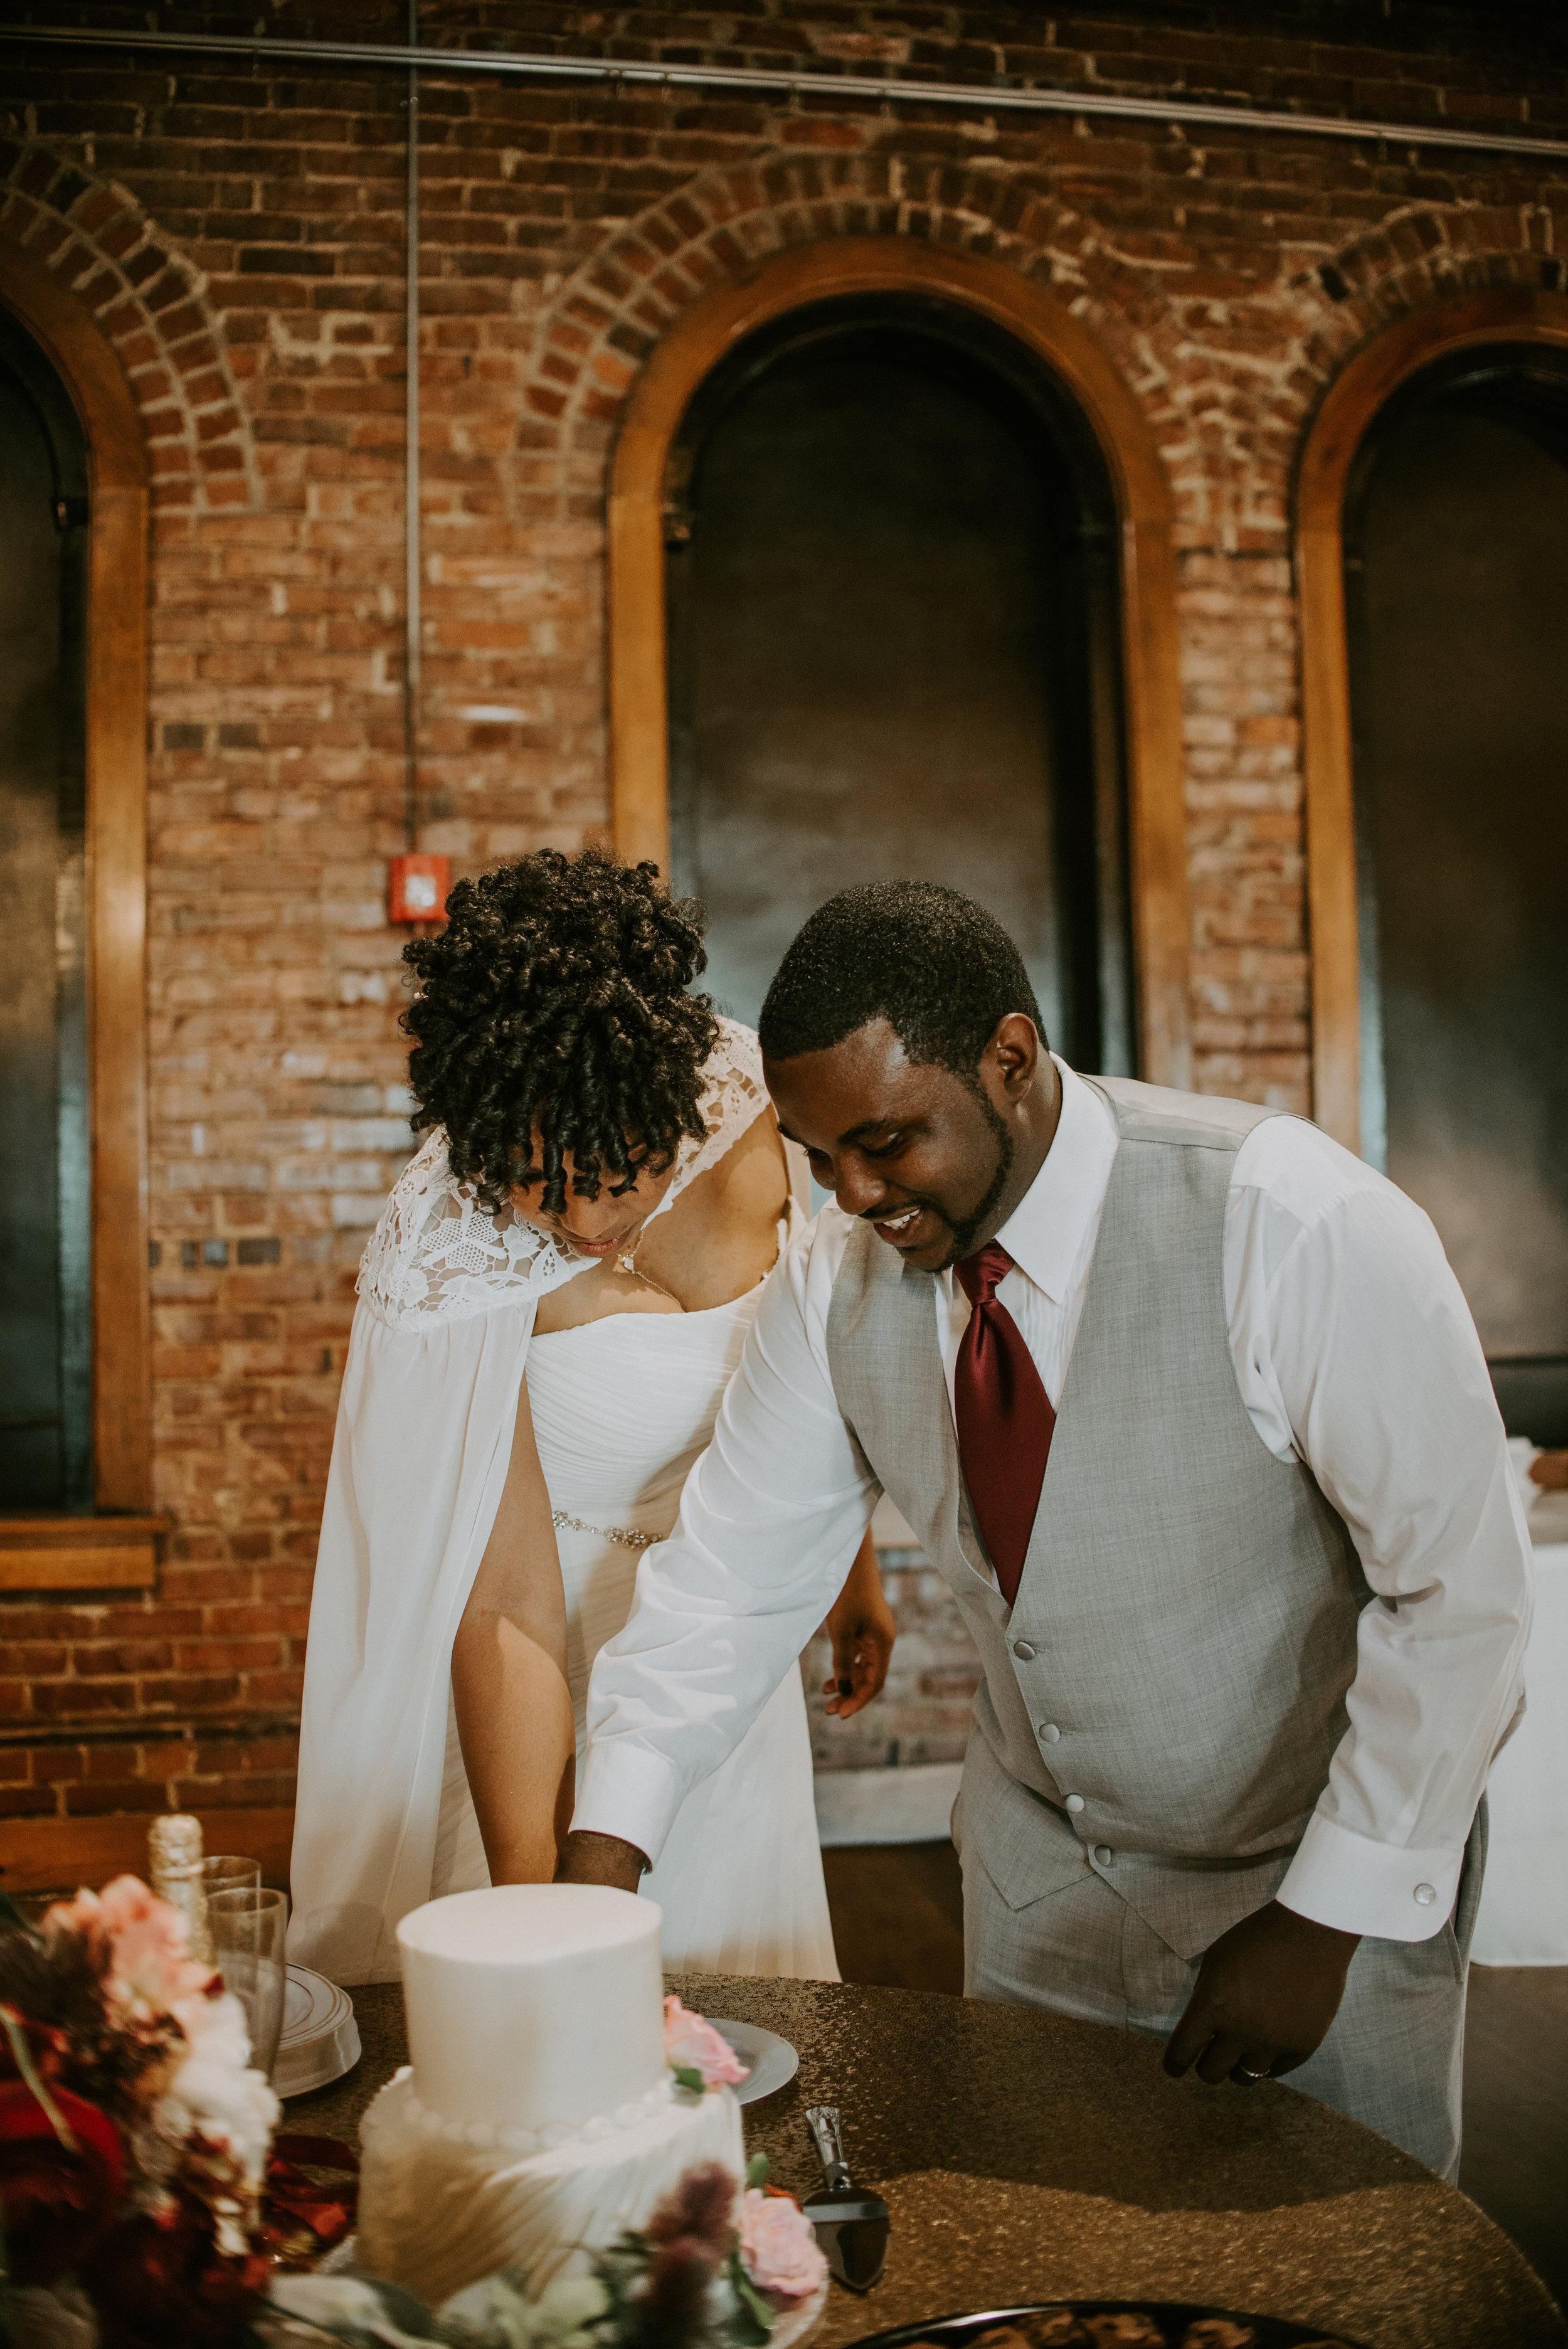 WonderlyCreative_Wedding_6.7.18_Khara&Dwayne_-905.jpg